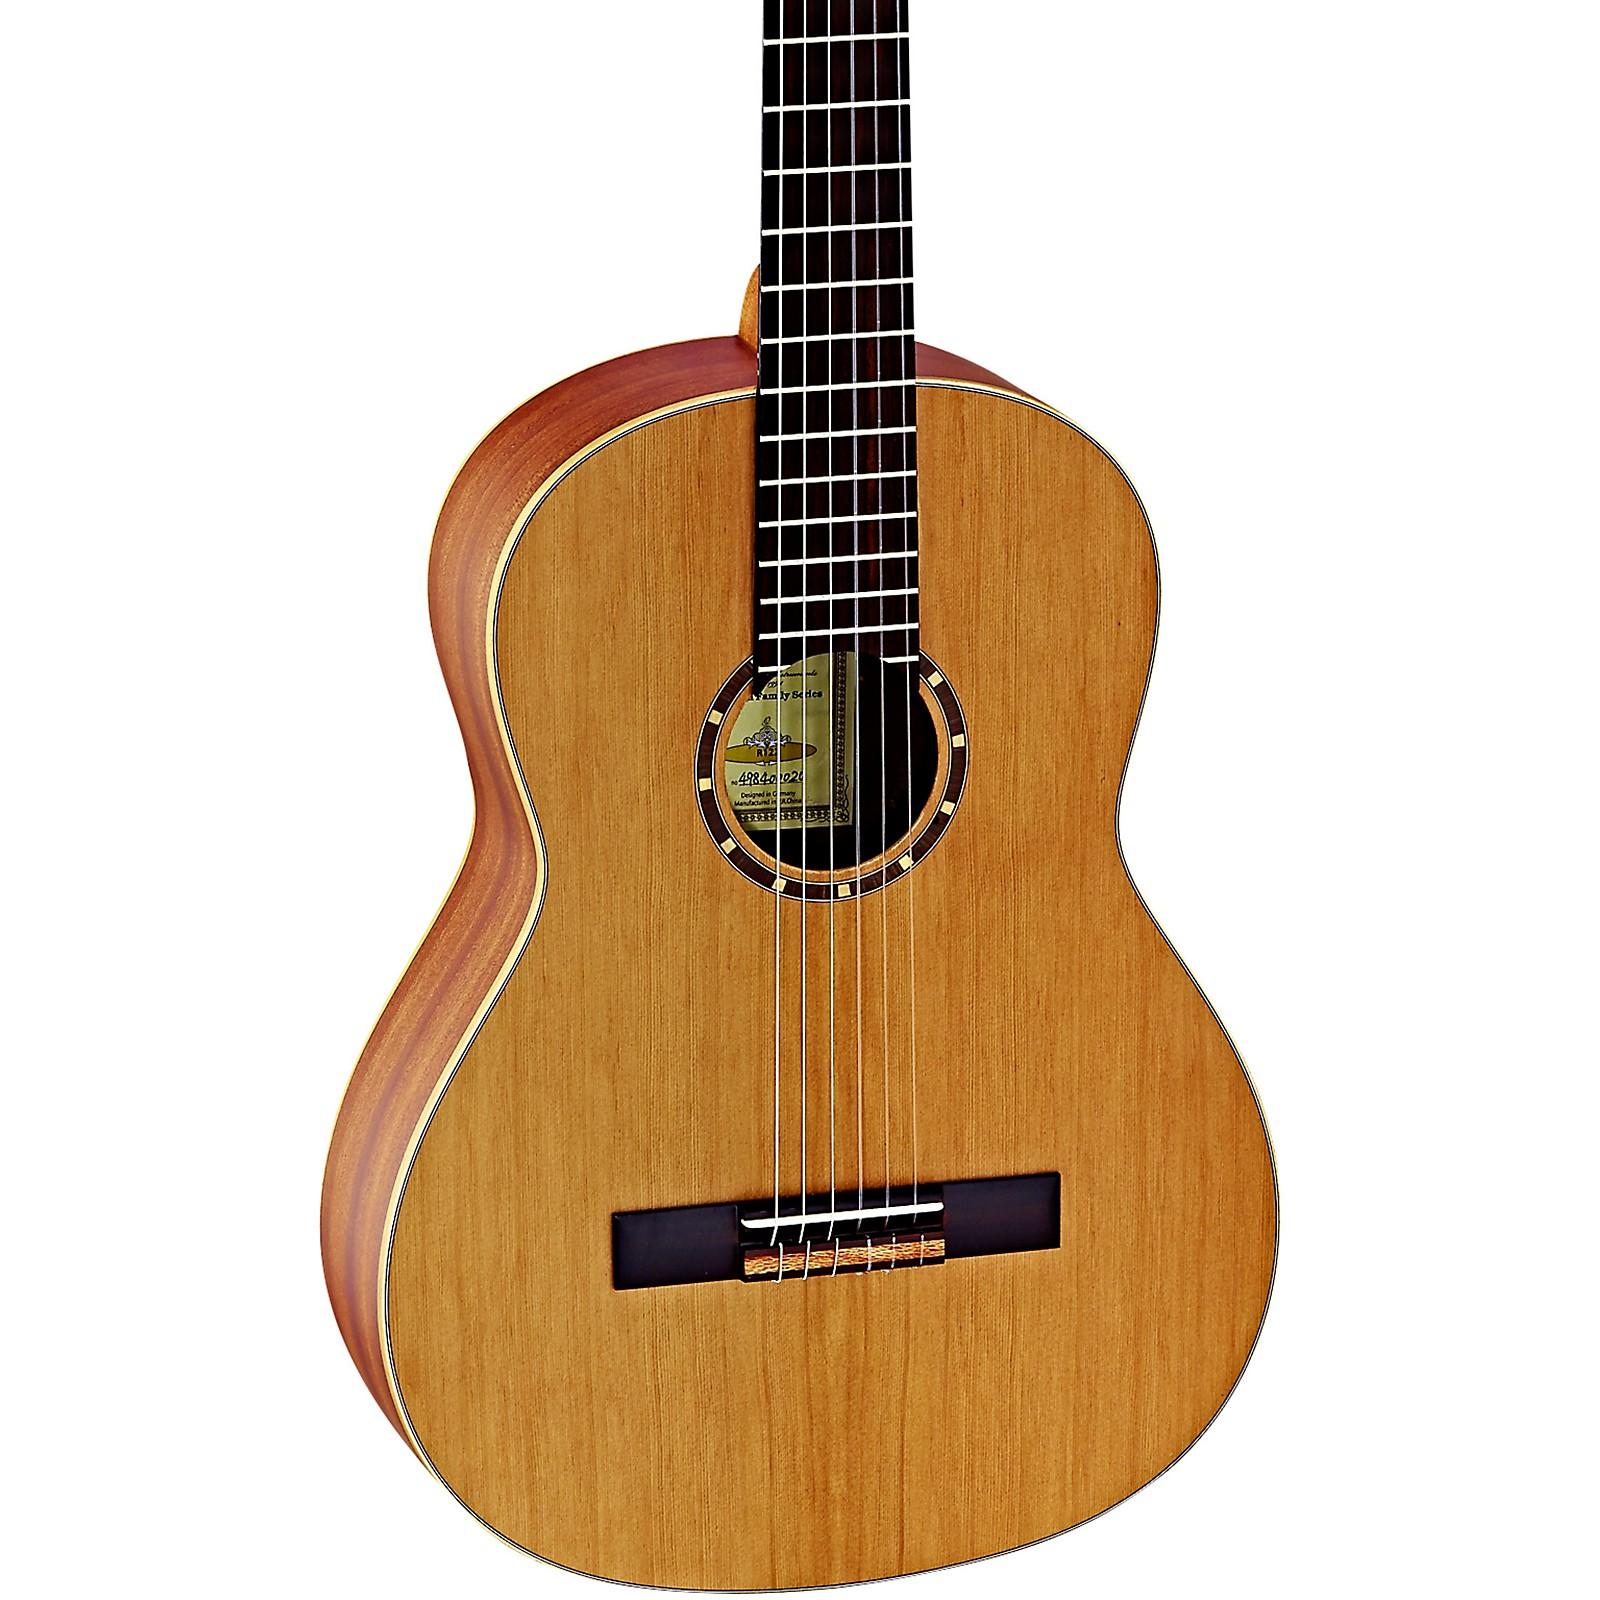 Ortega Family Series R122 Classical Guitar